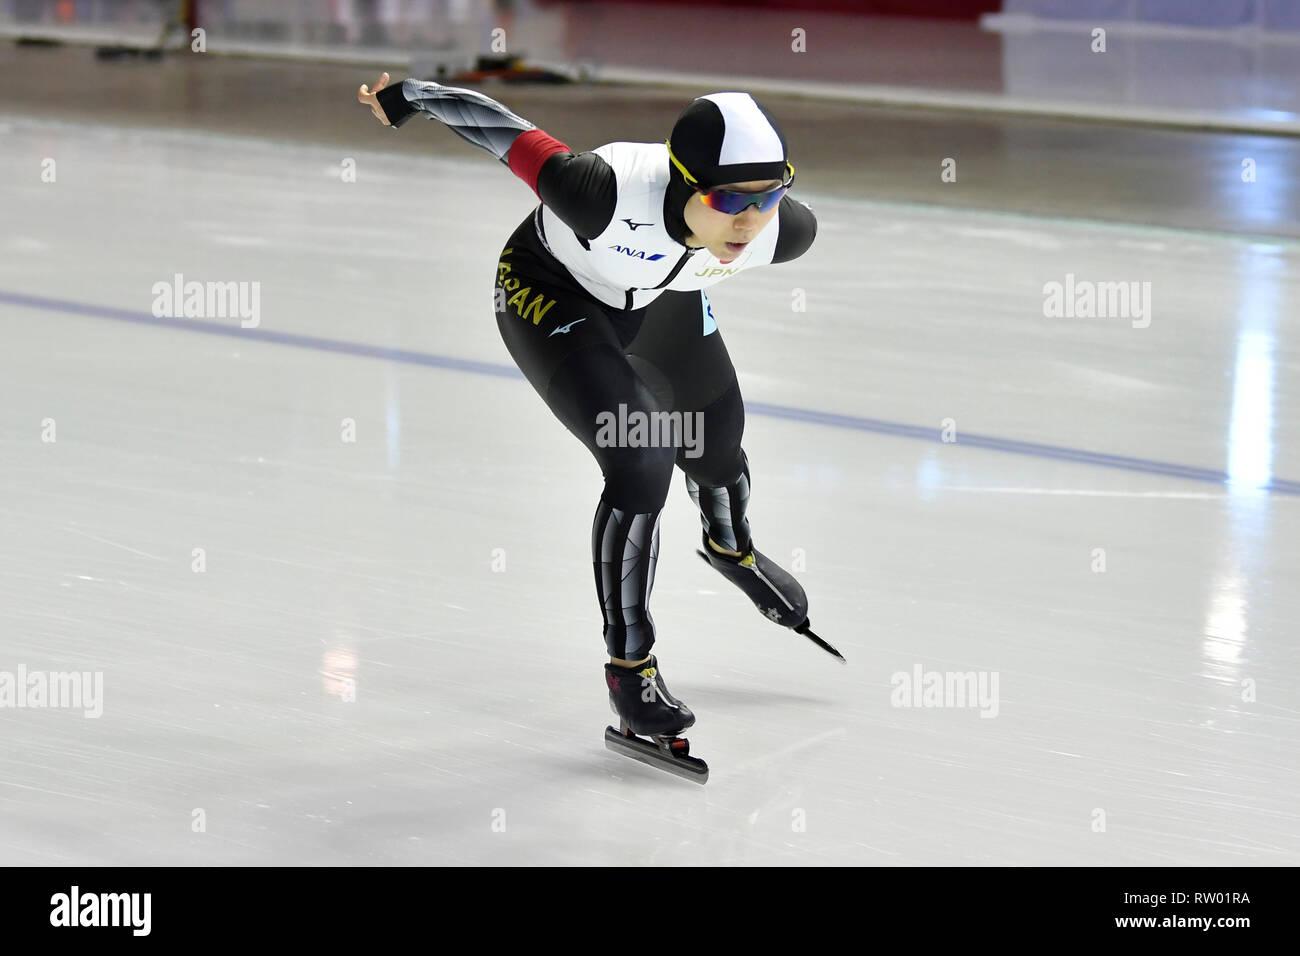 Speed Skating ISU World Championships Allround 2019 on March 2 2019 a the Olympics Oval in Calgary, Canada. Miho Takagi (JPN) Credit: Huub Snoep/SCS/AFLO/Alamy Live News - Stock Image